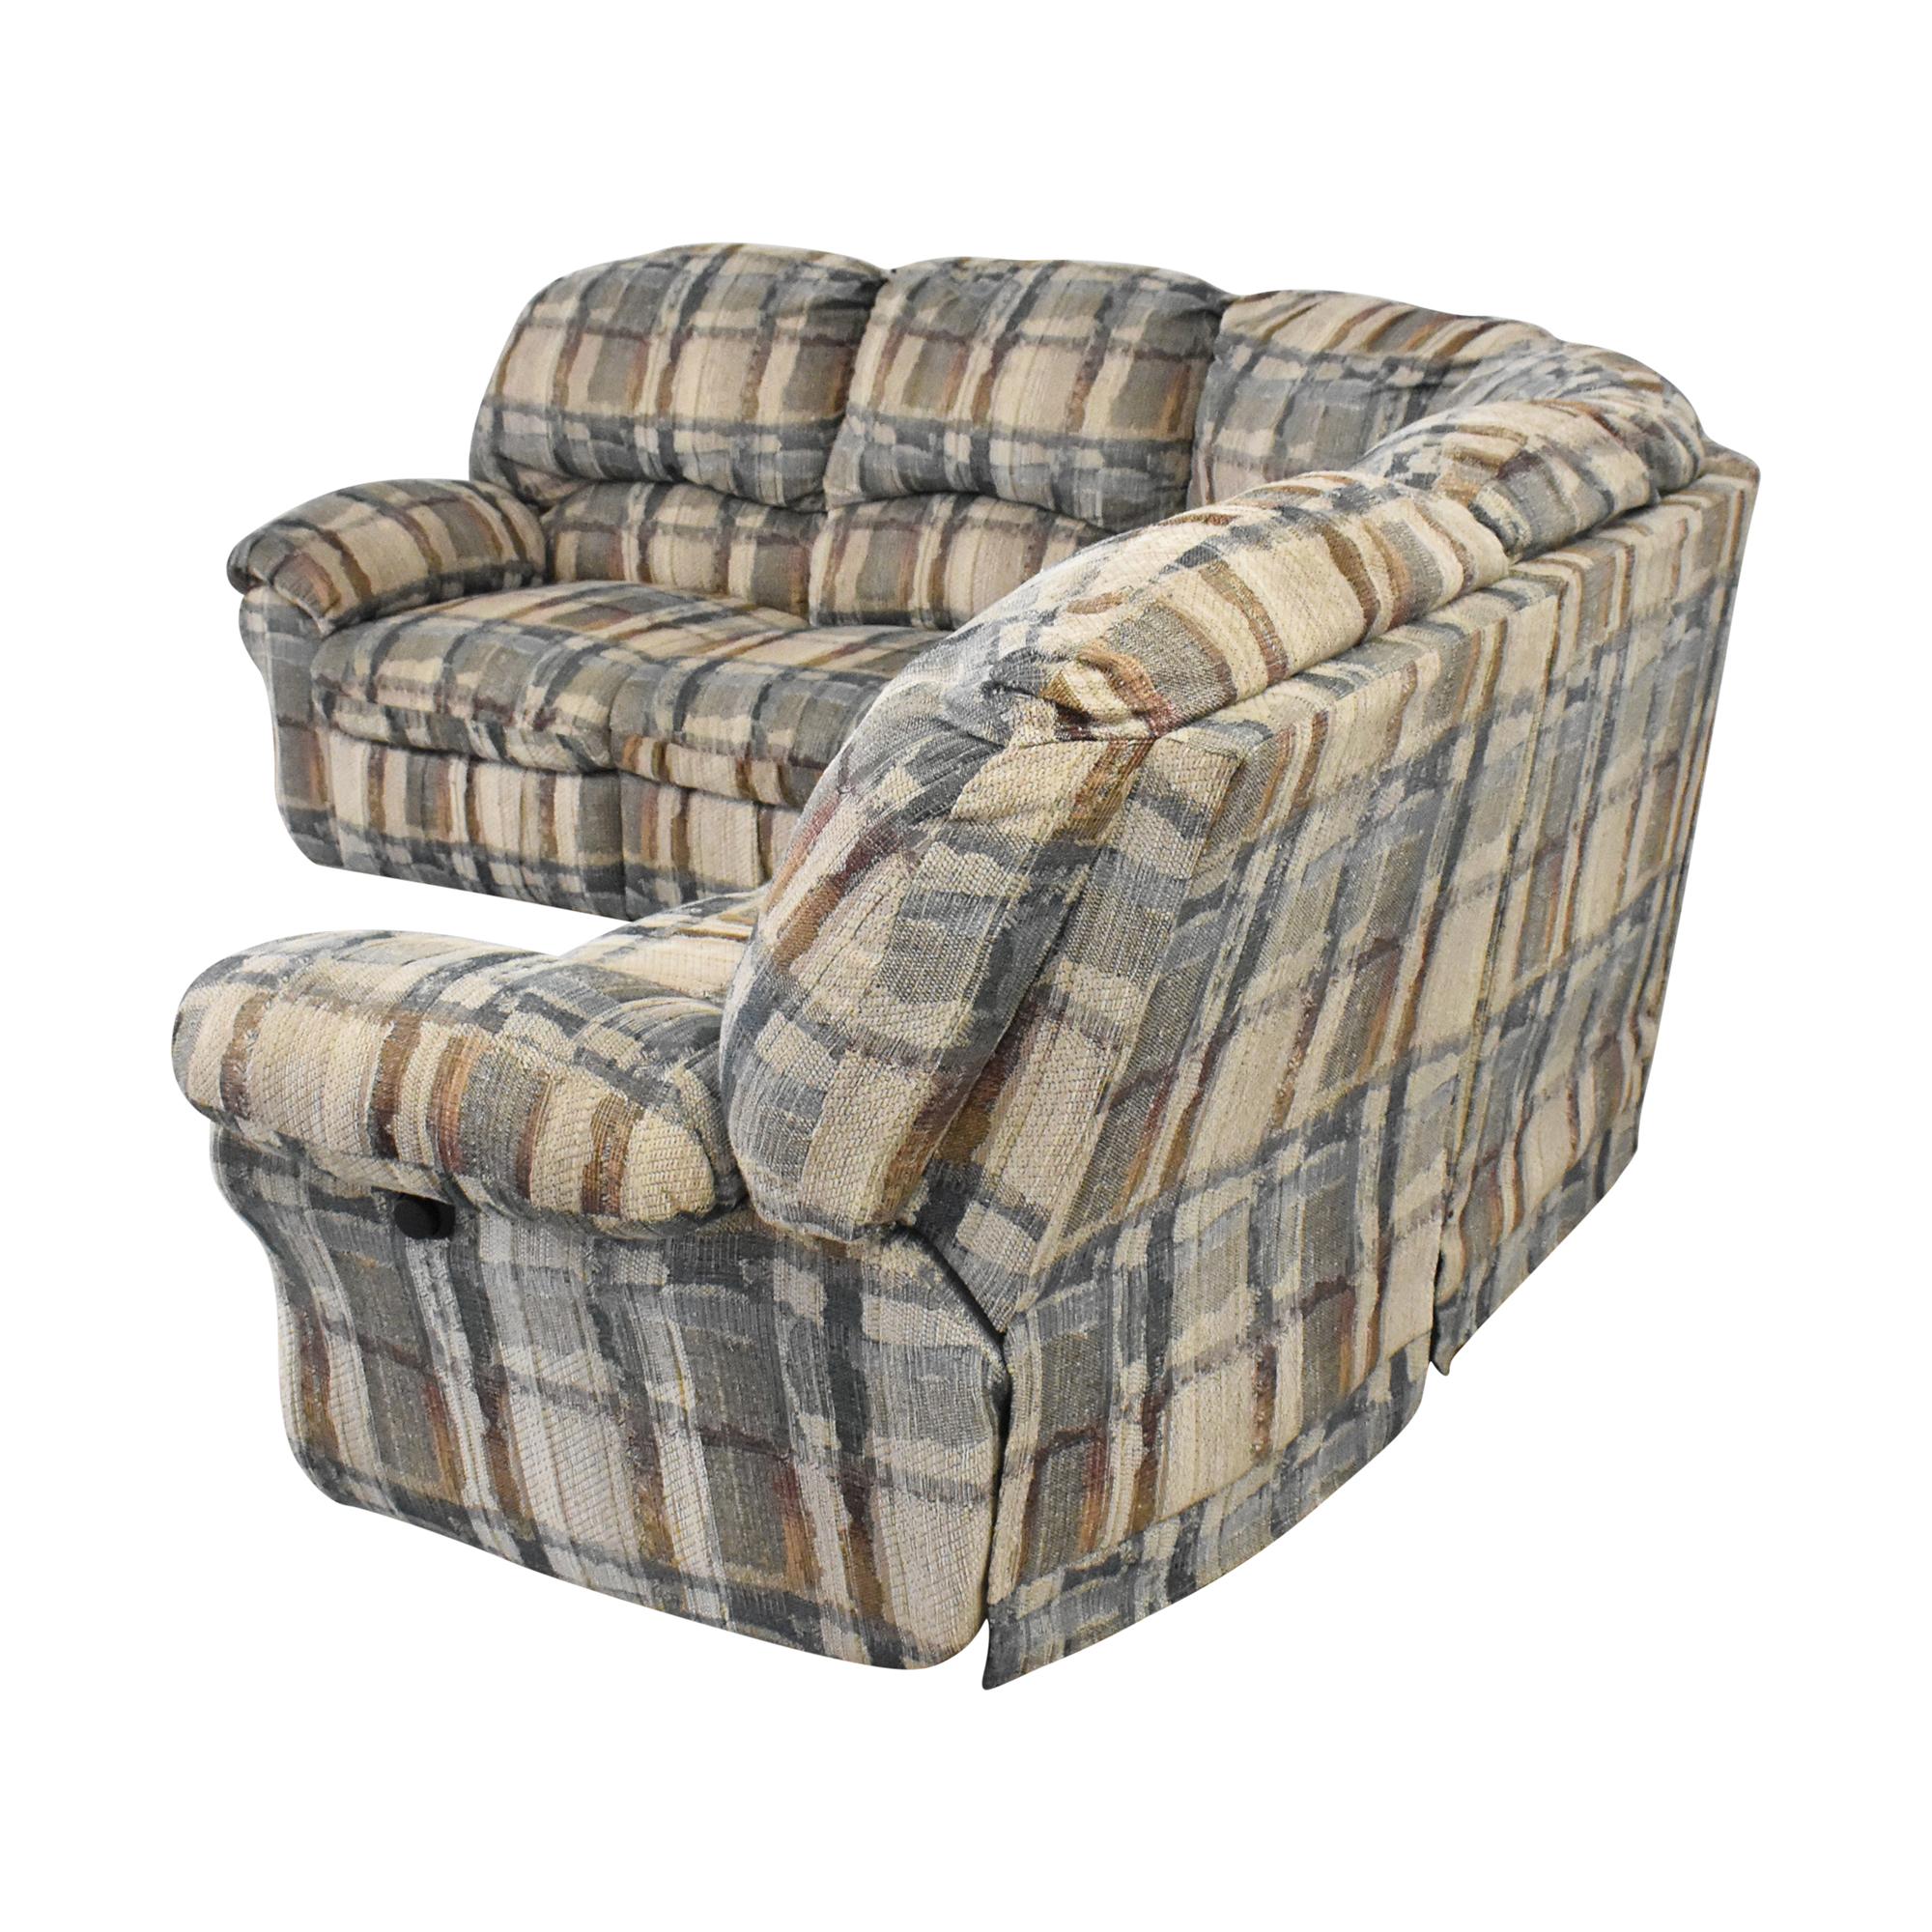 Berkline Berkline Crescent Sectional Sofa with Recliners dimensions